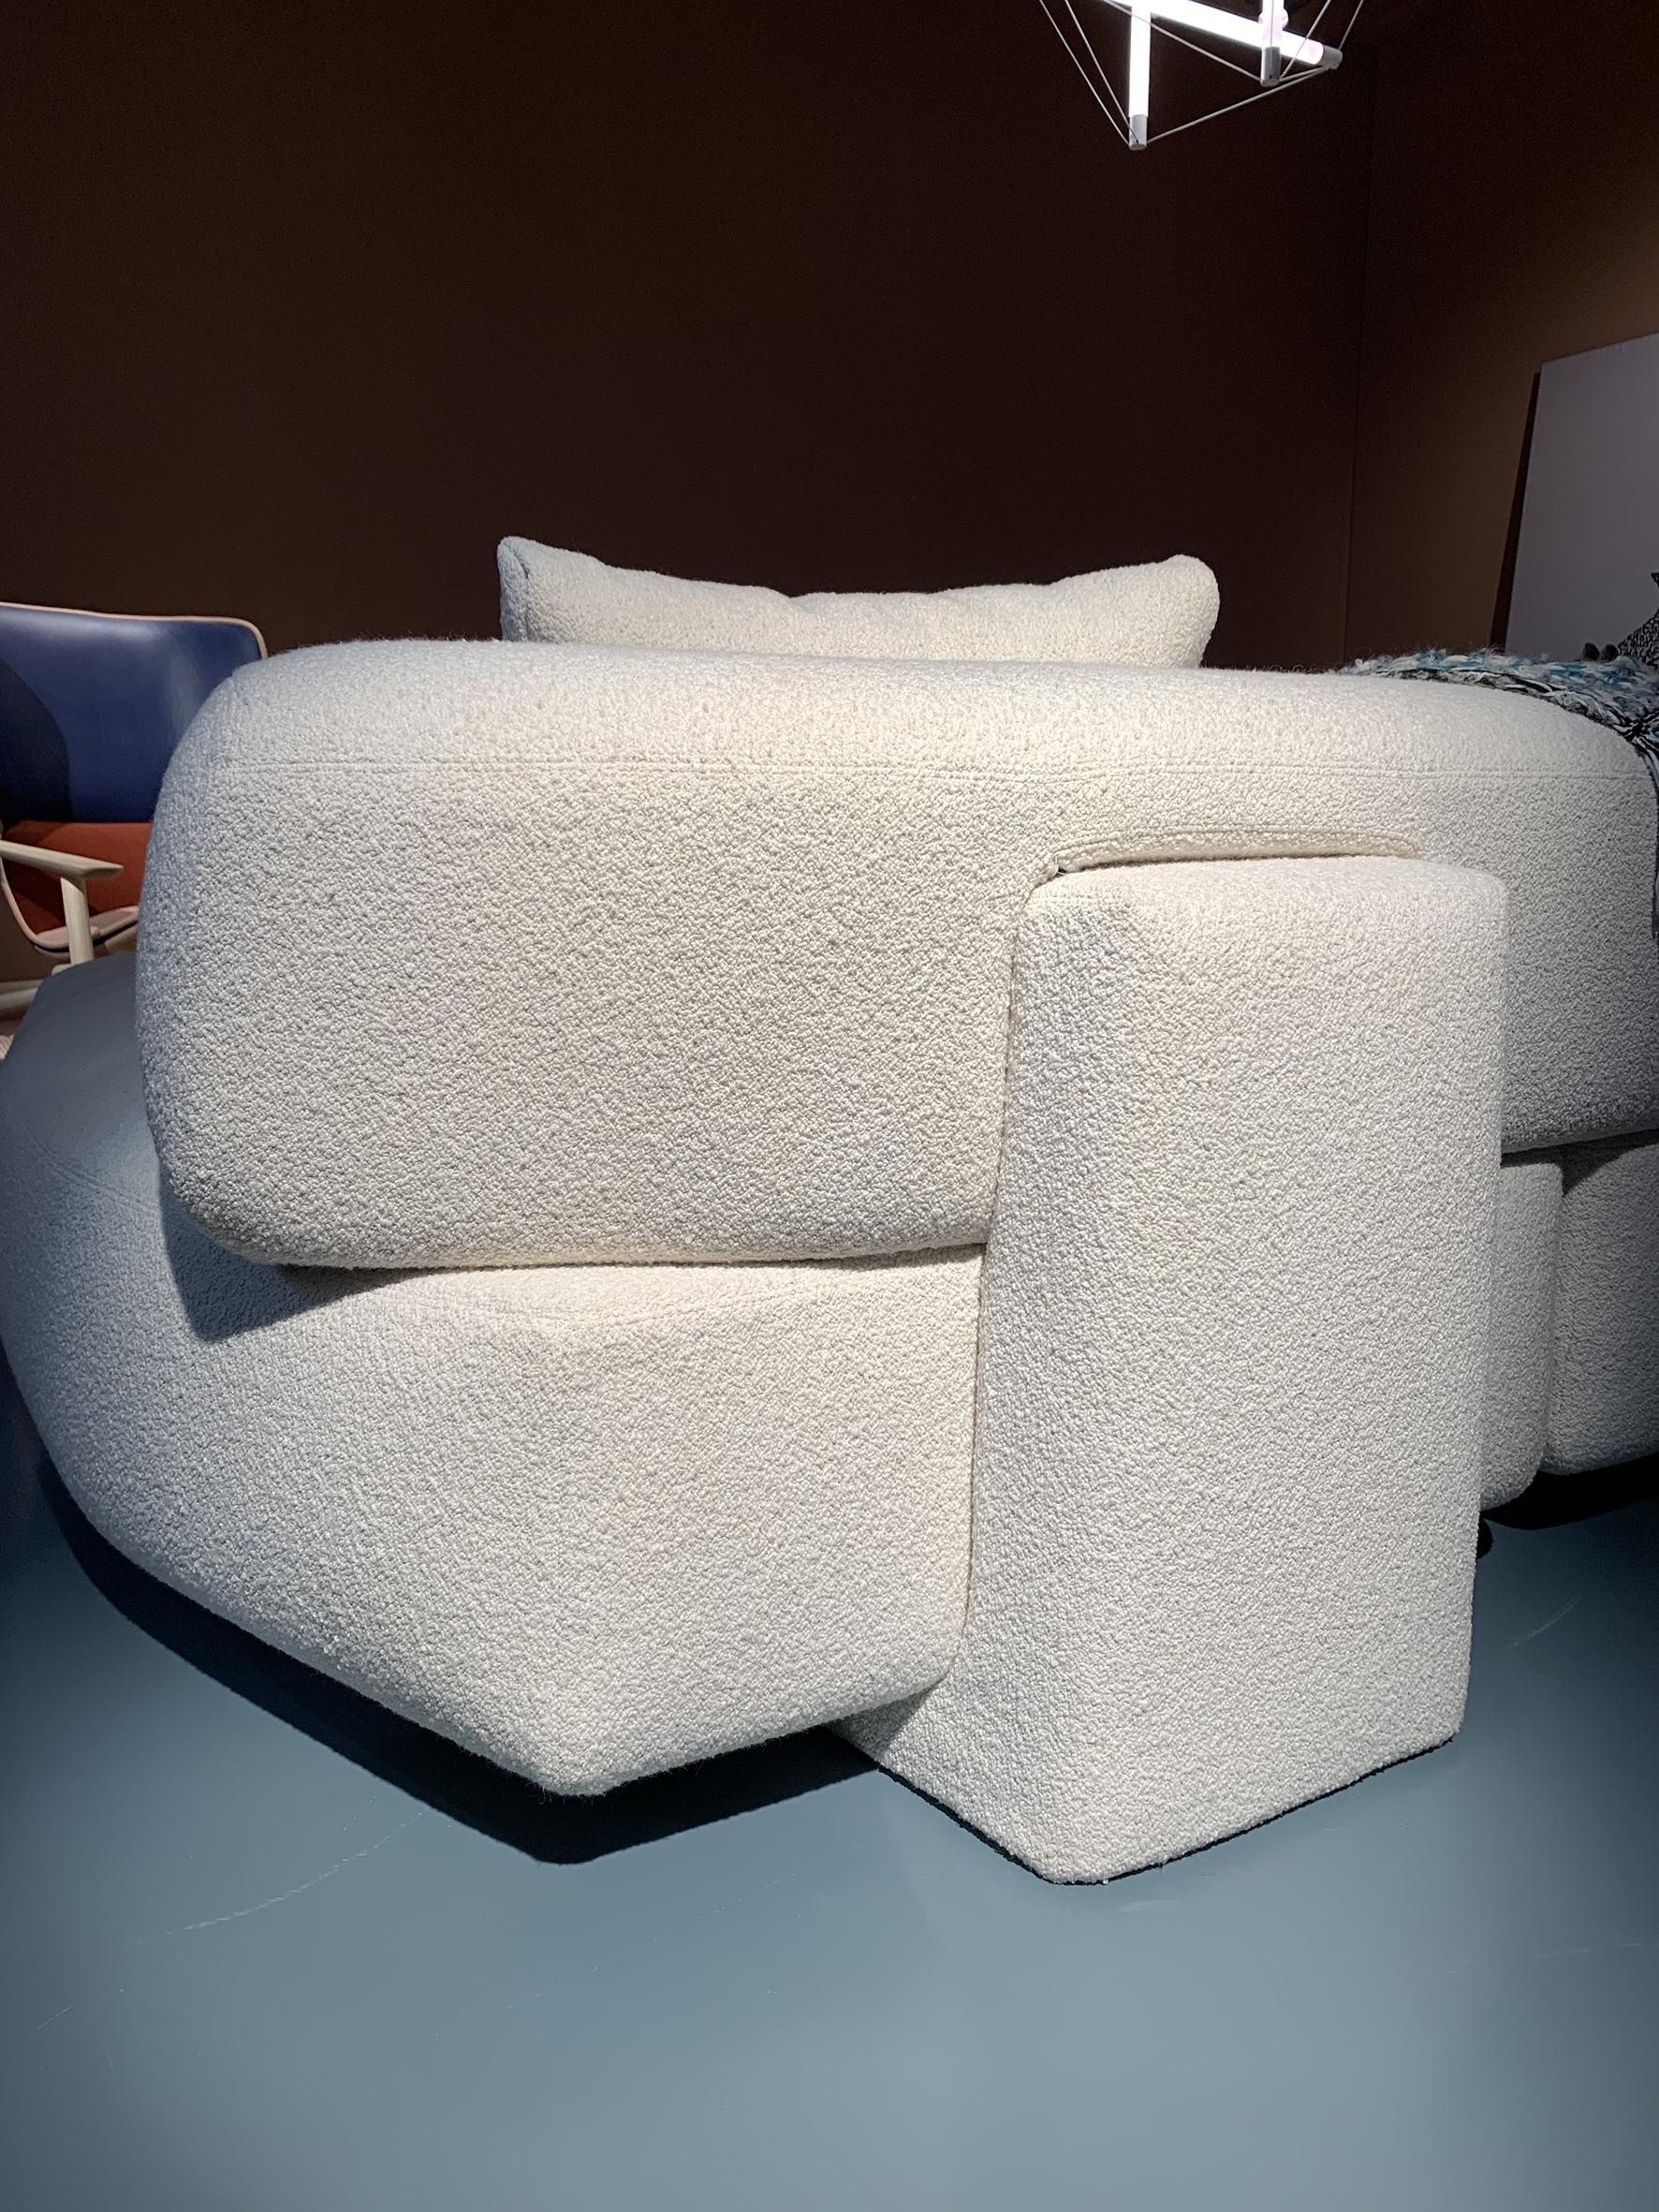 Moroso Gogan sofa.jpg